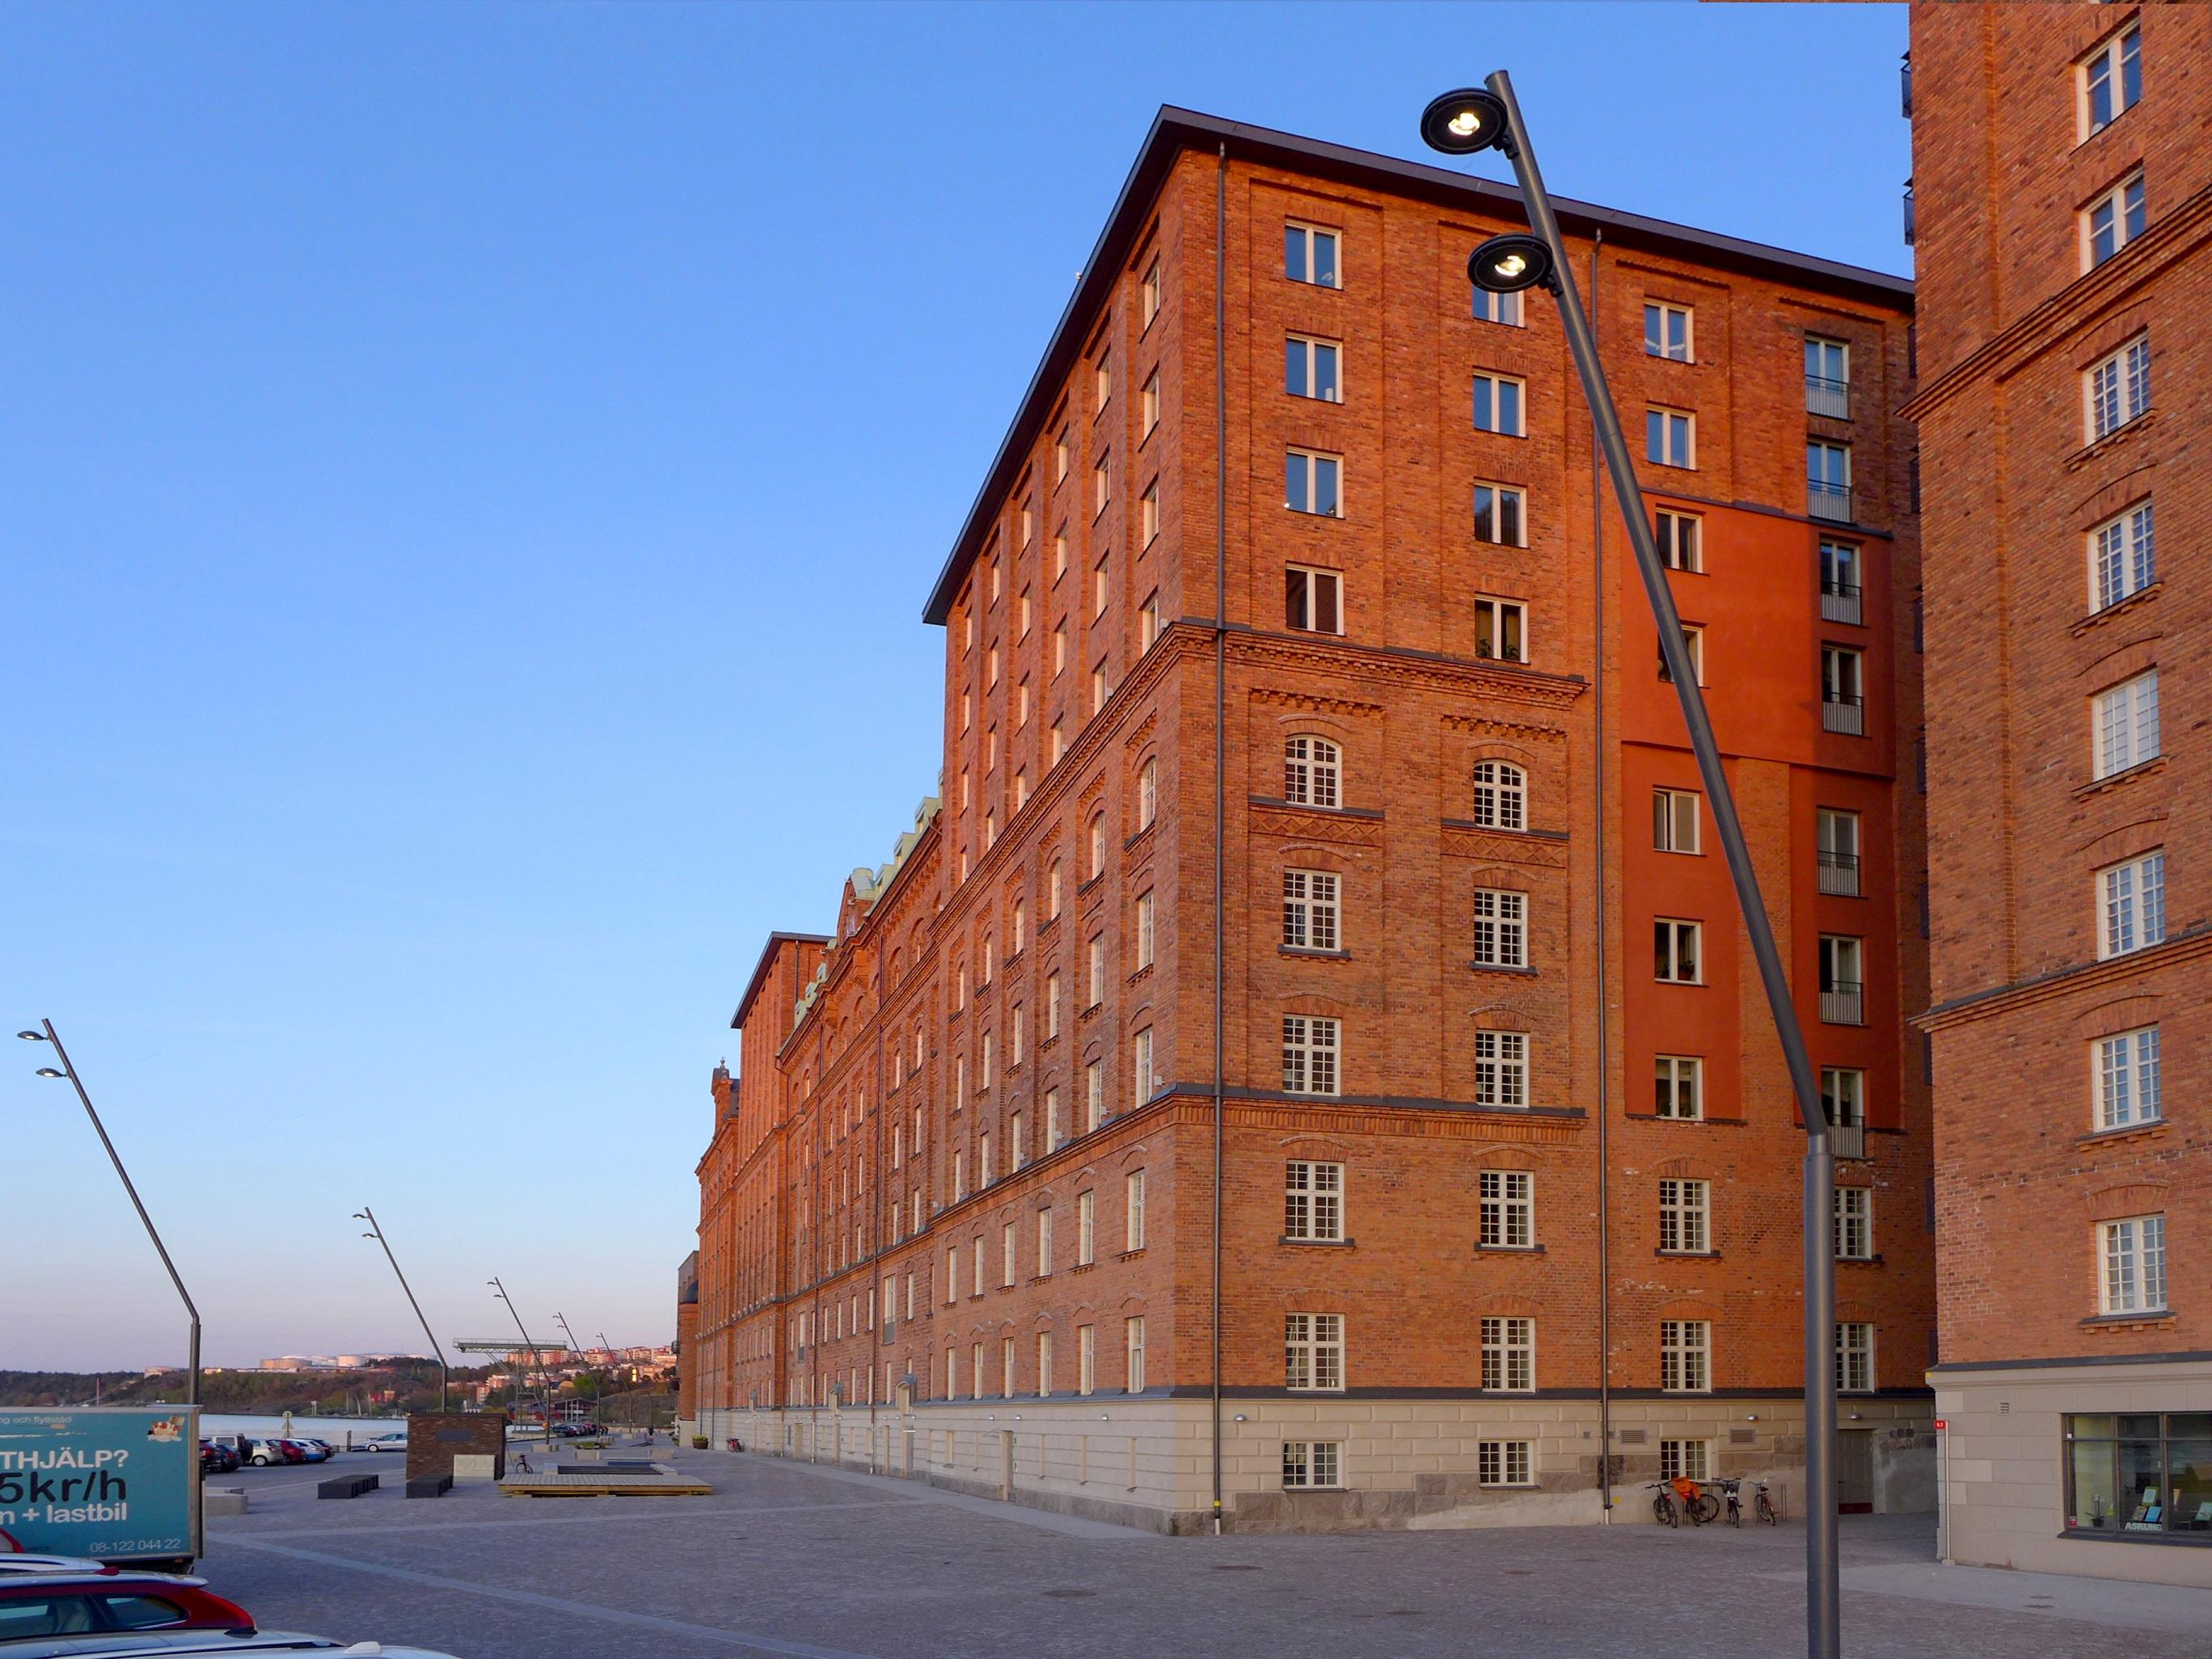 Ombyggnad Qvarnen Tre Kronor